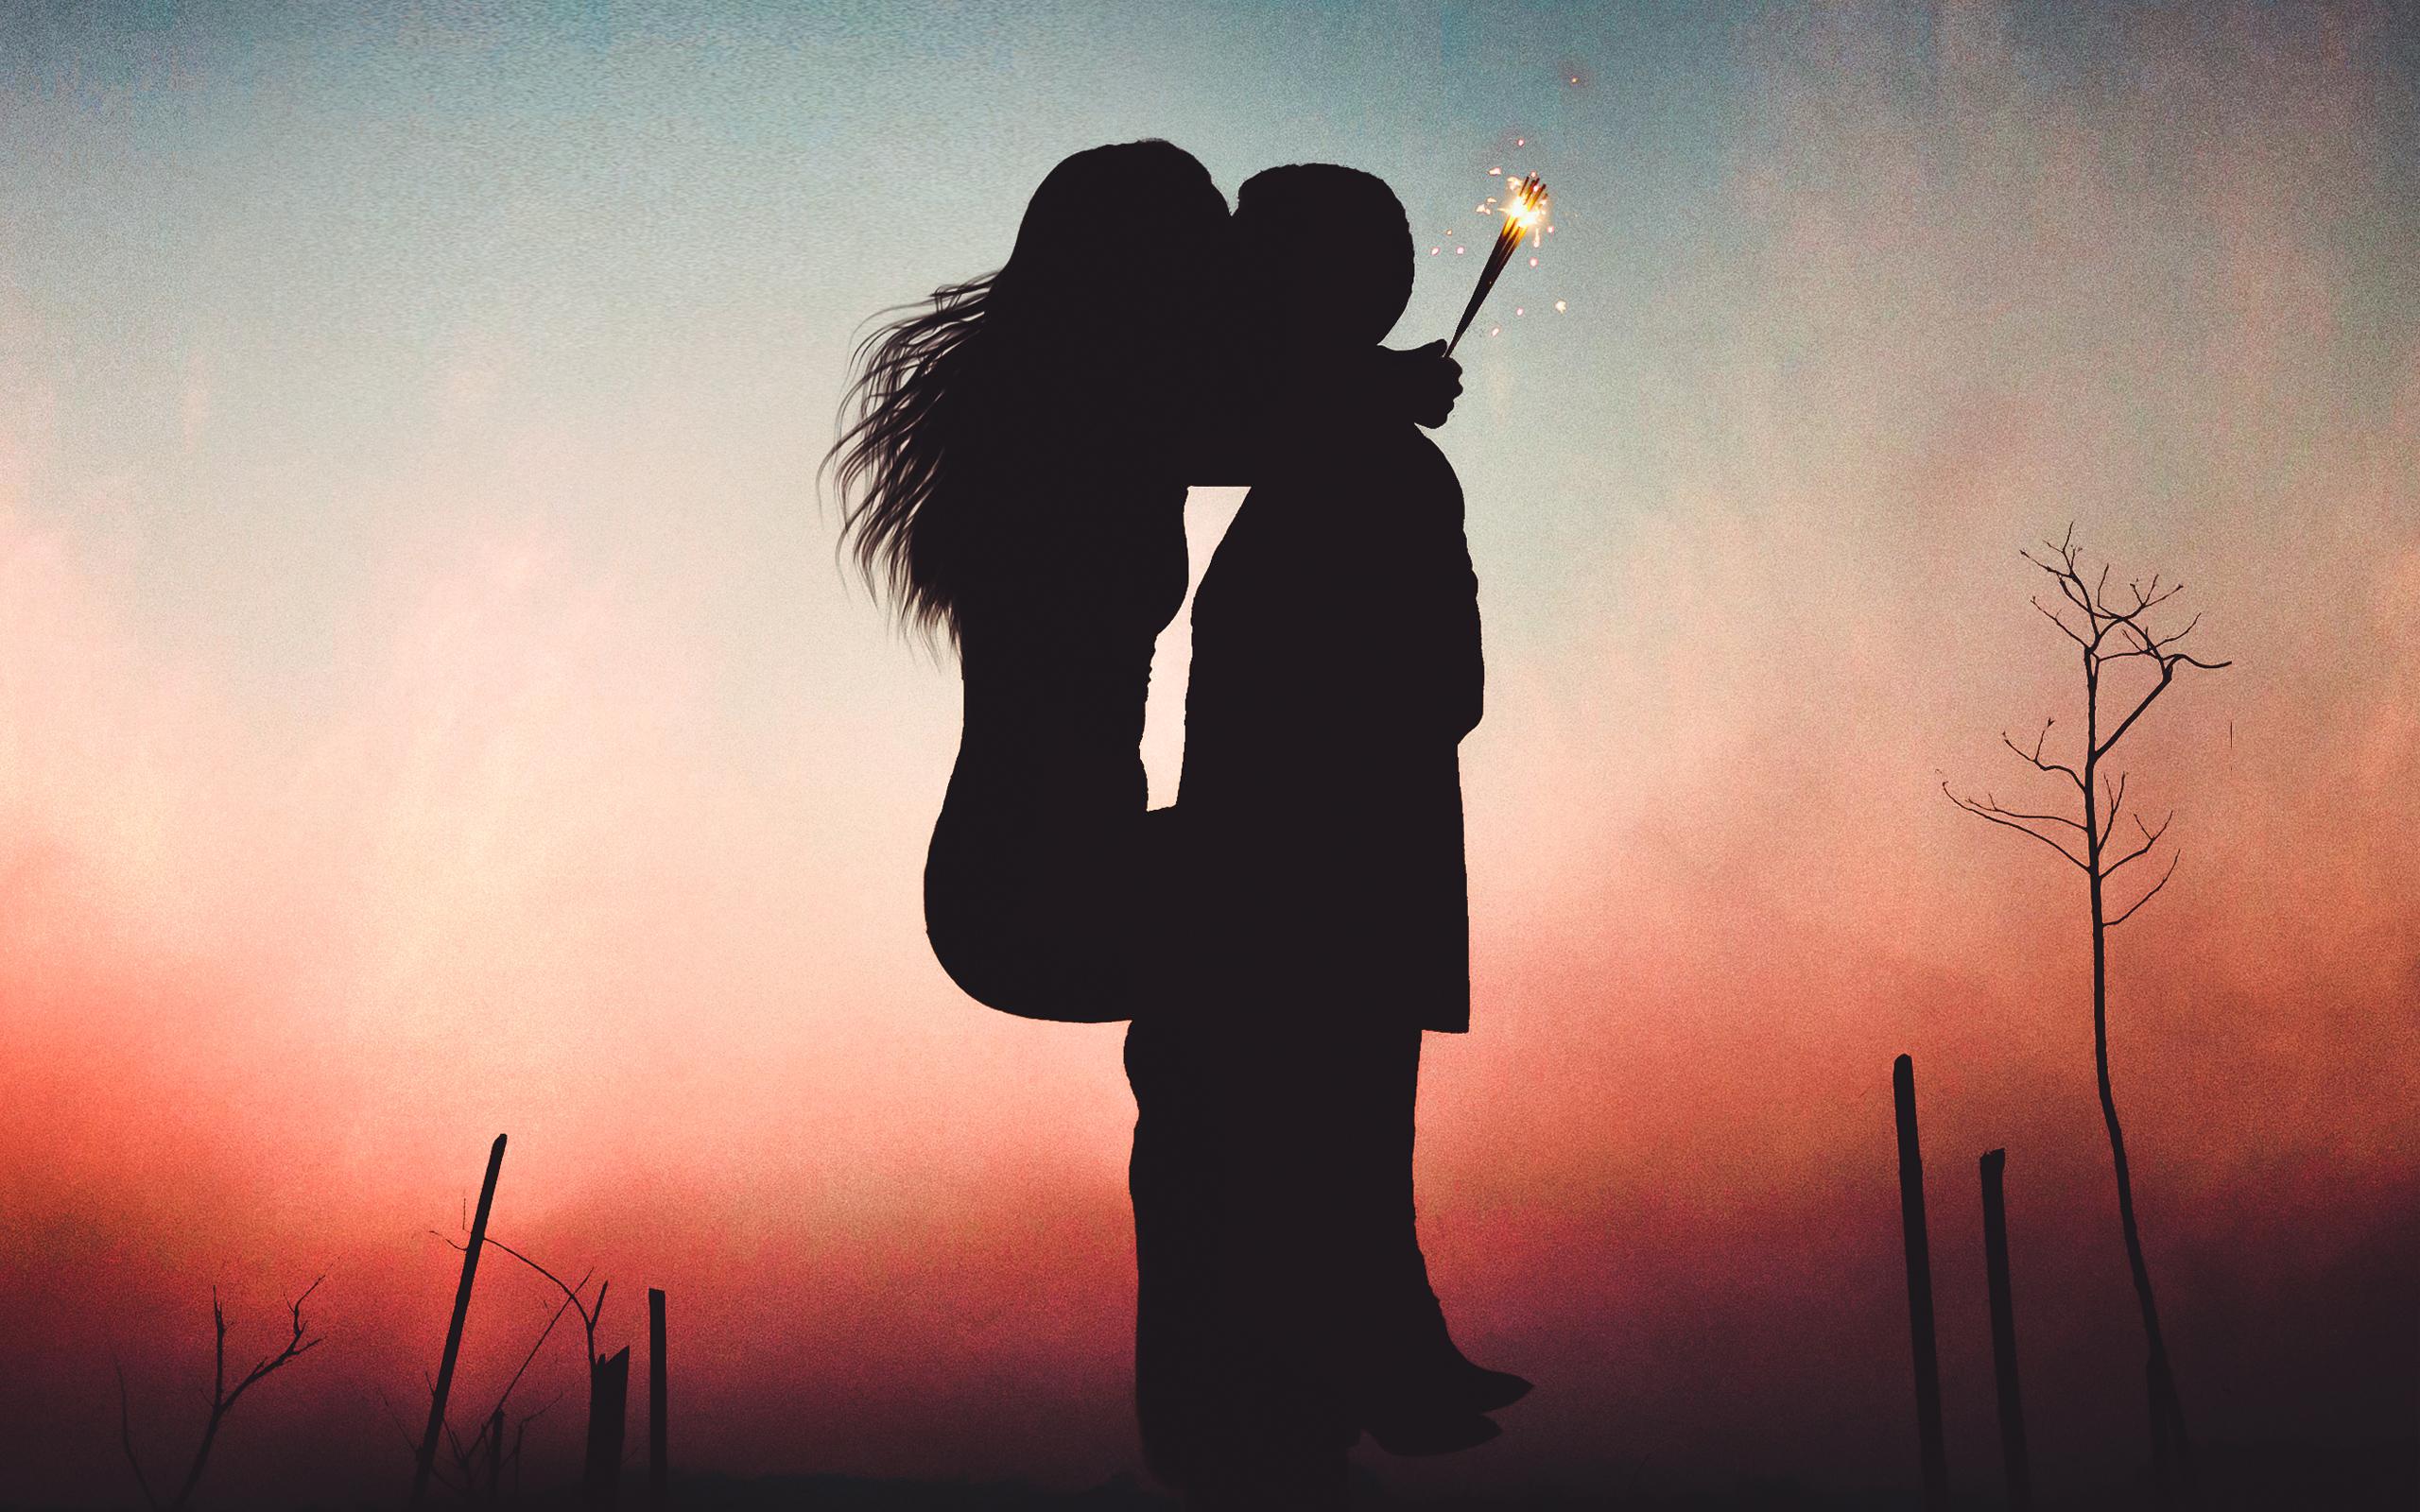 Couple Kiss Wallpaper Download - High